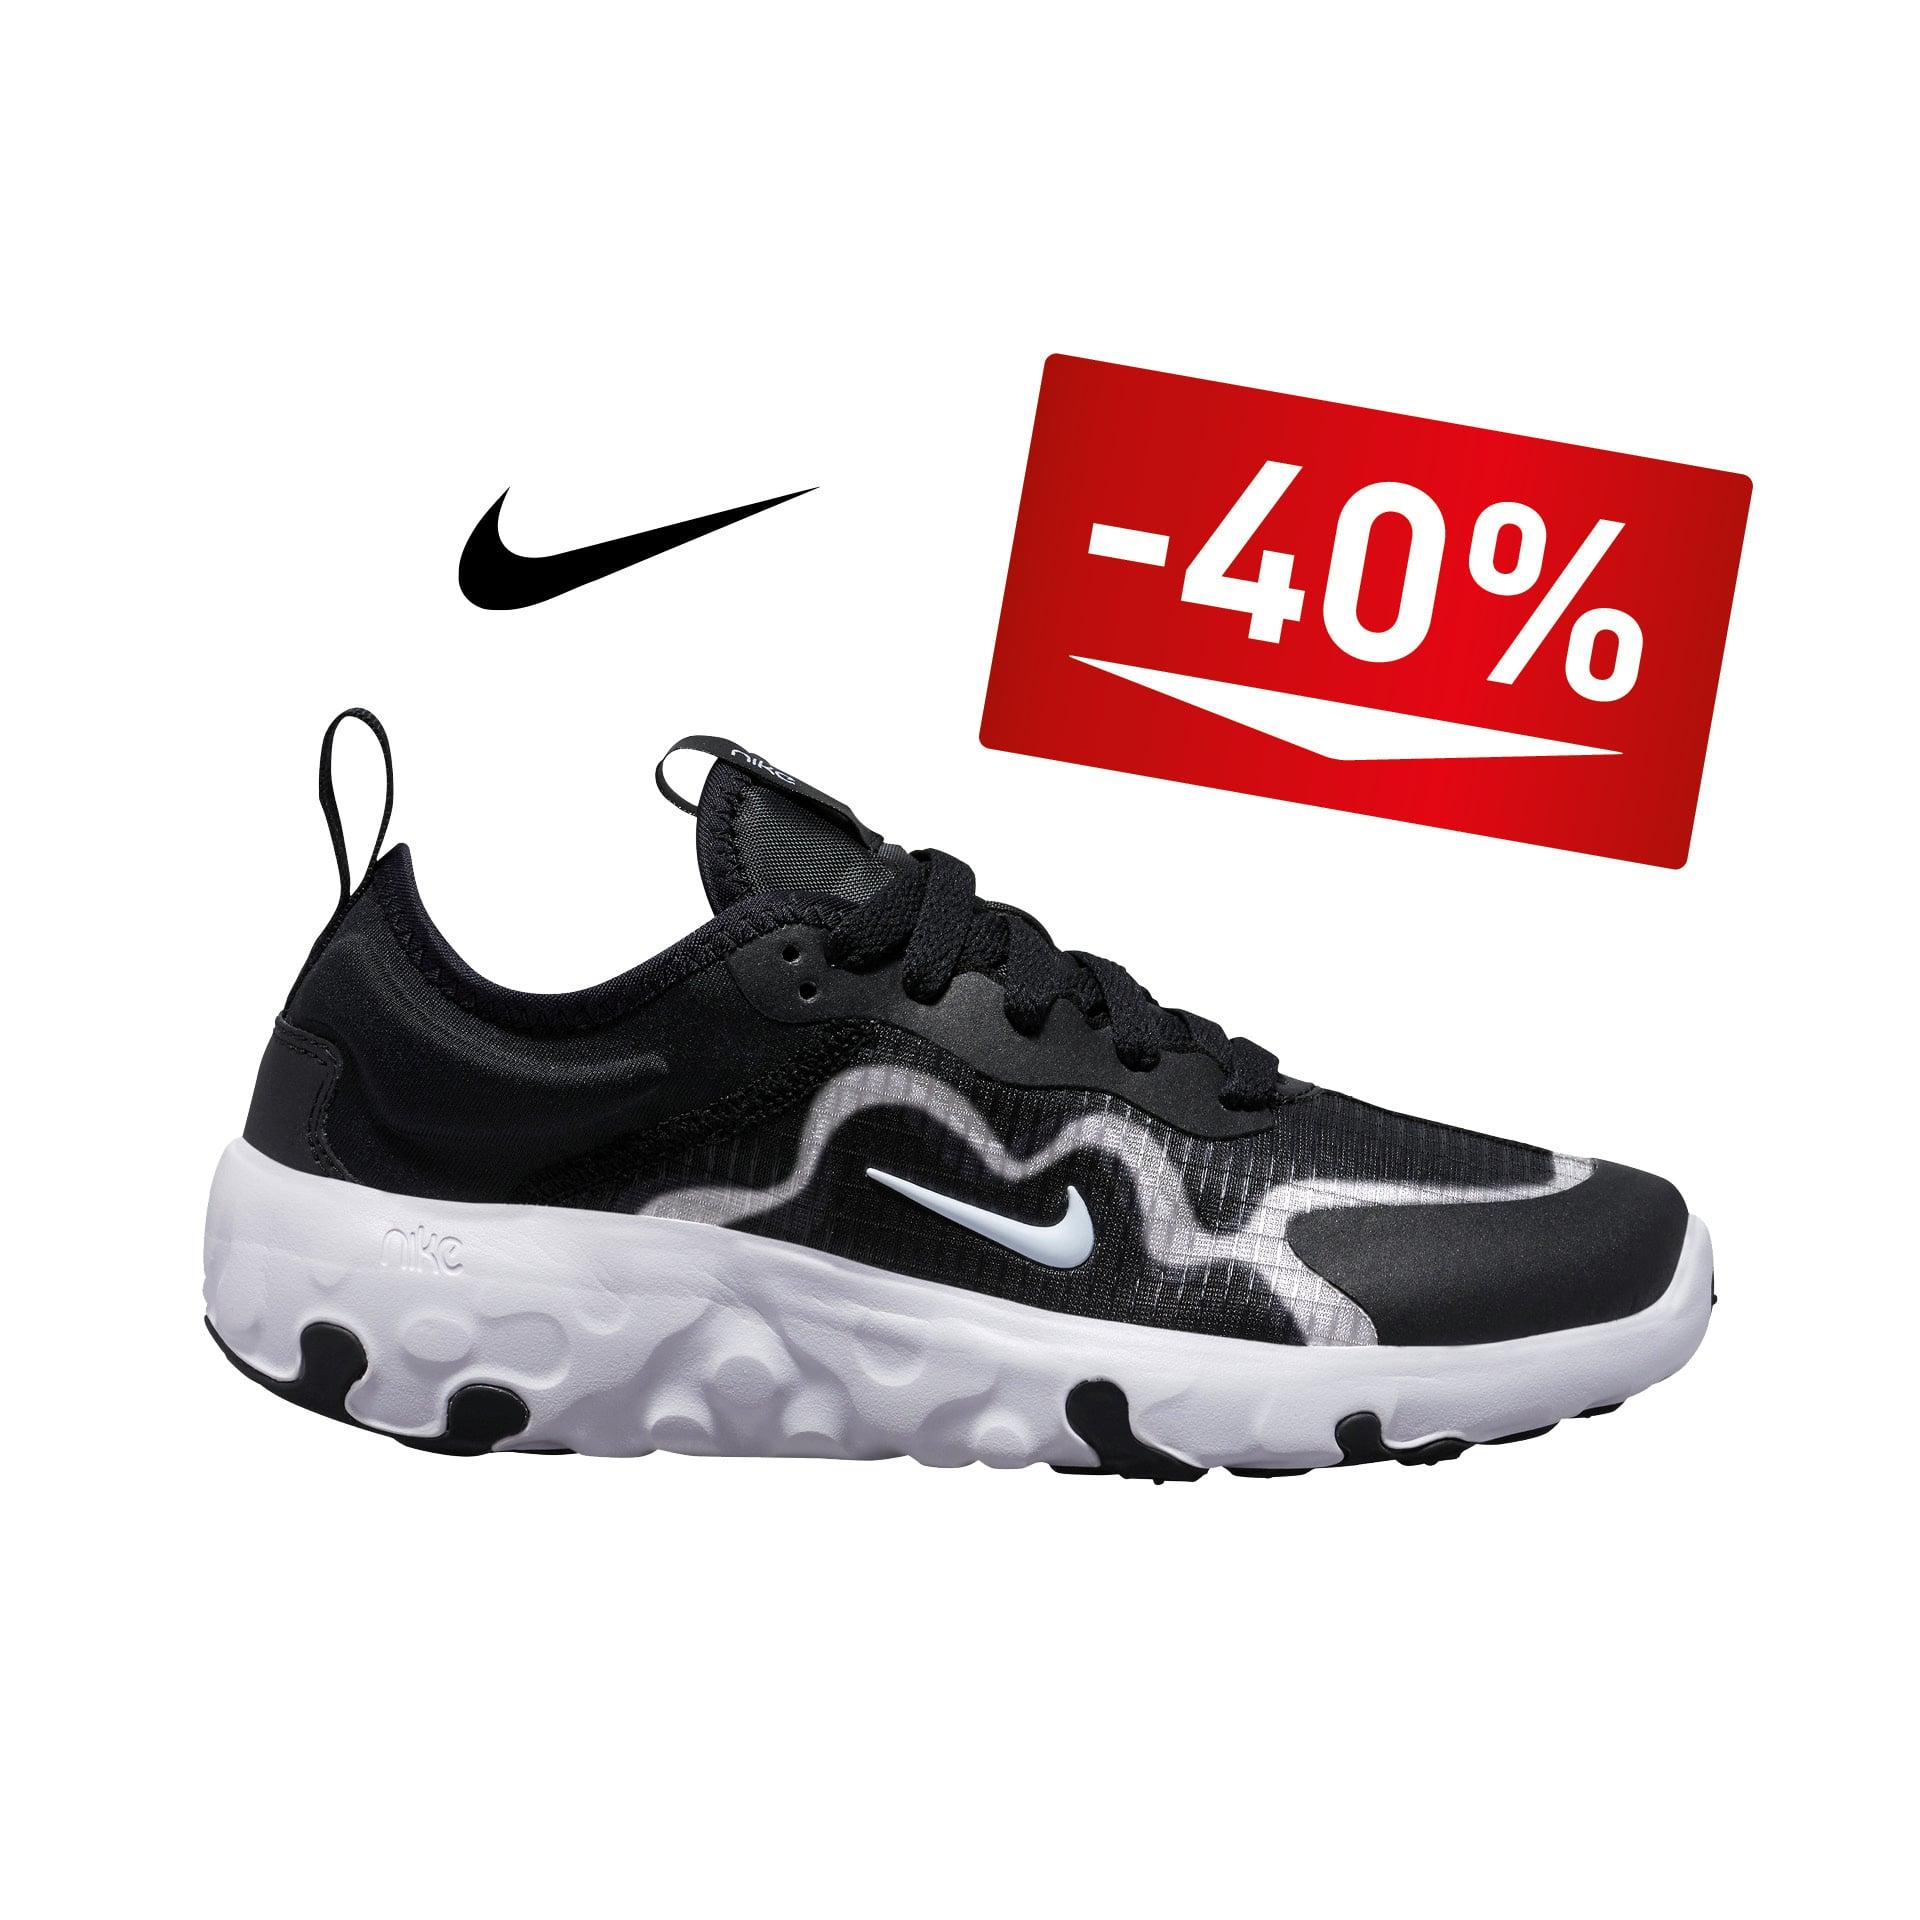 Nike Renew Lucent -40%